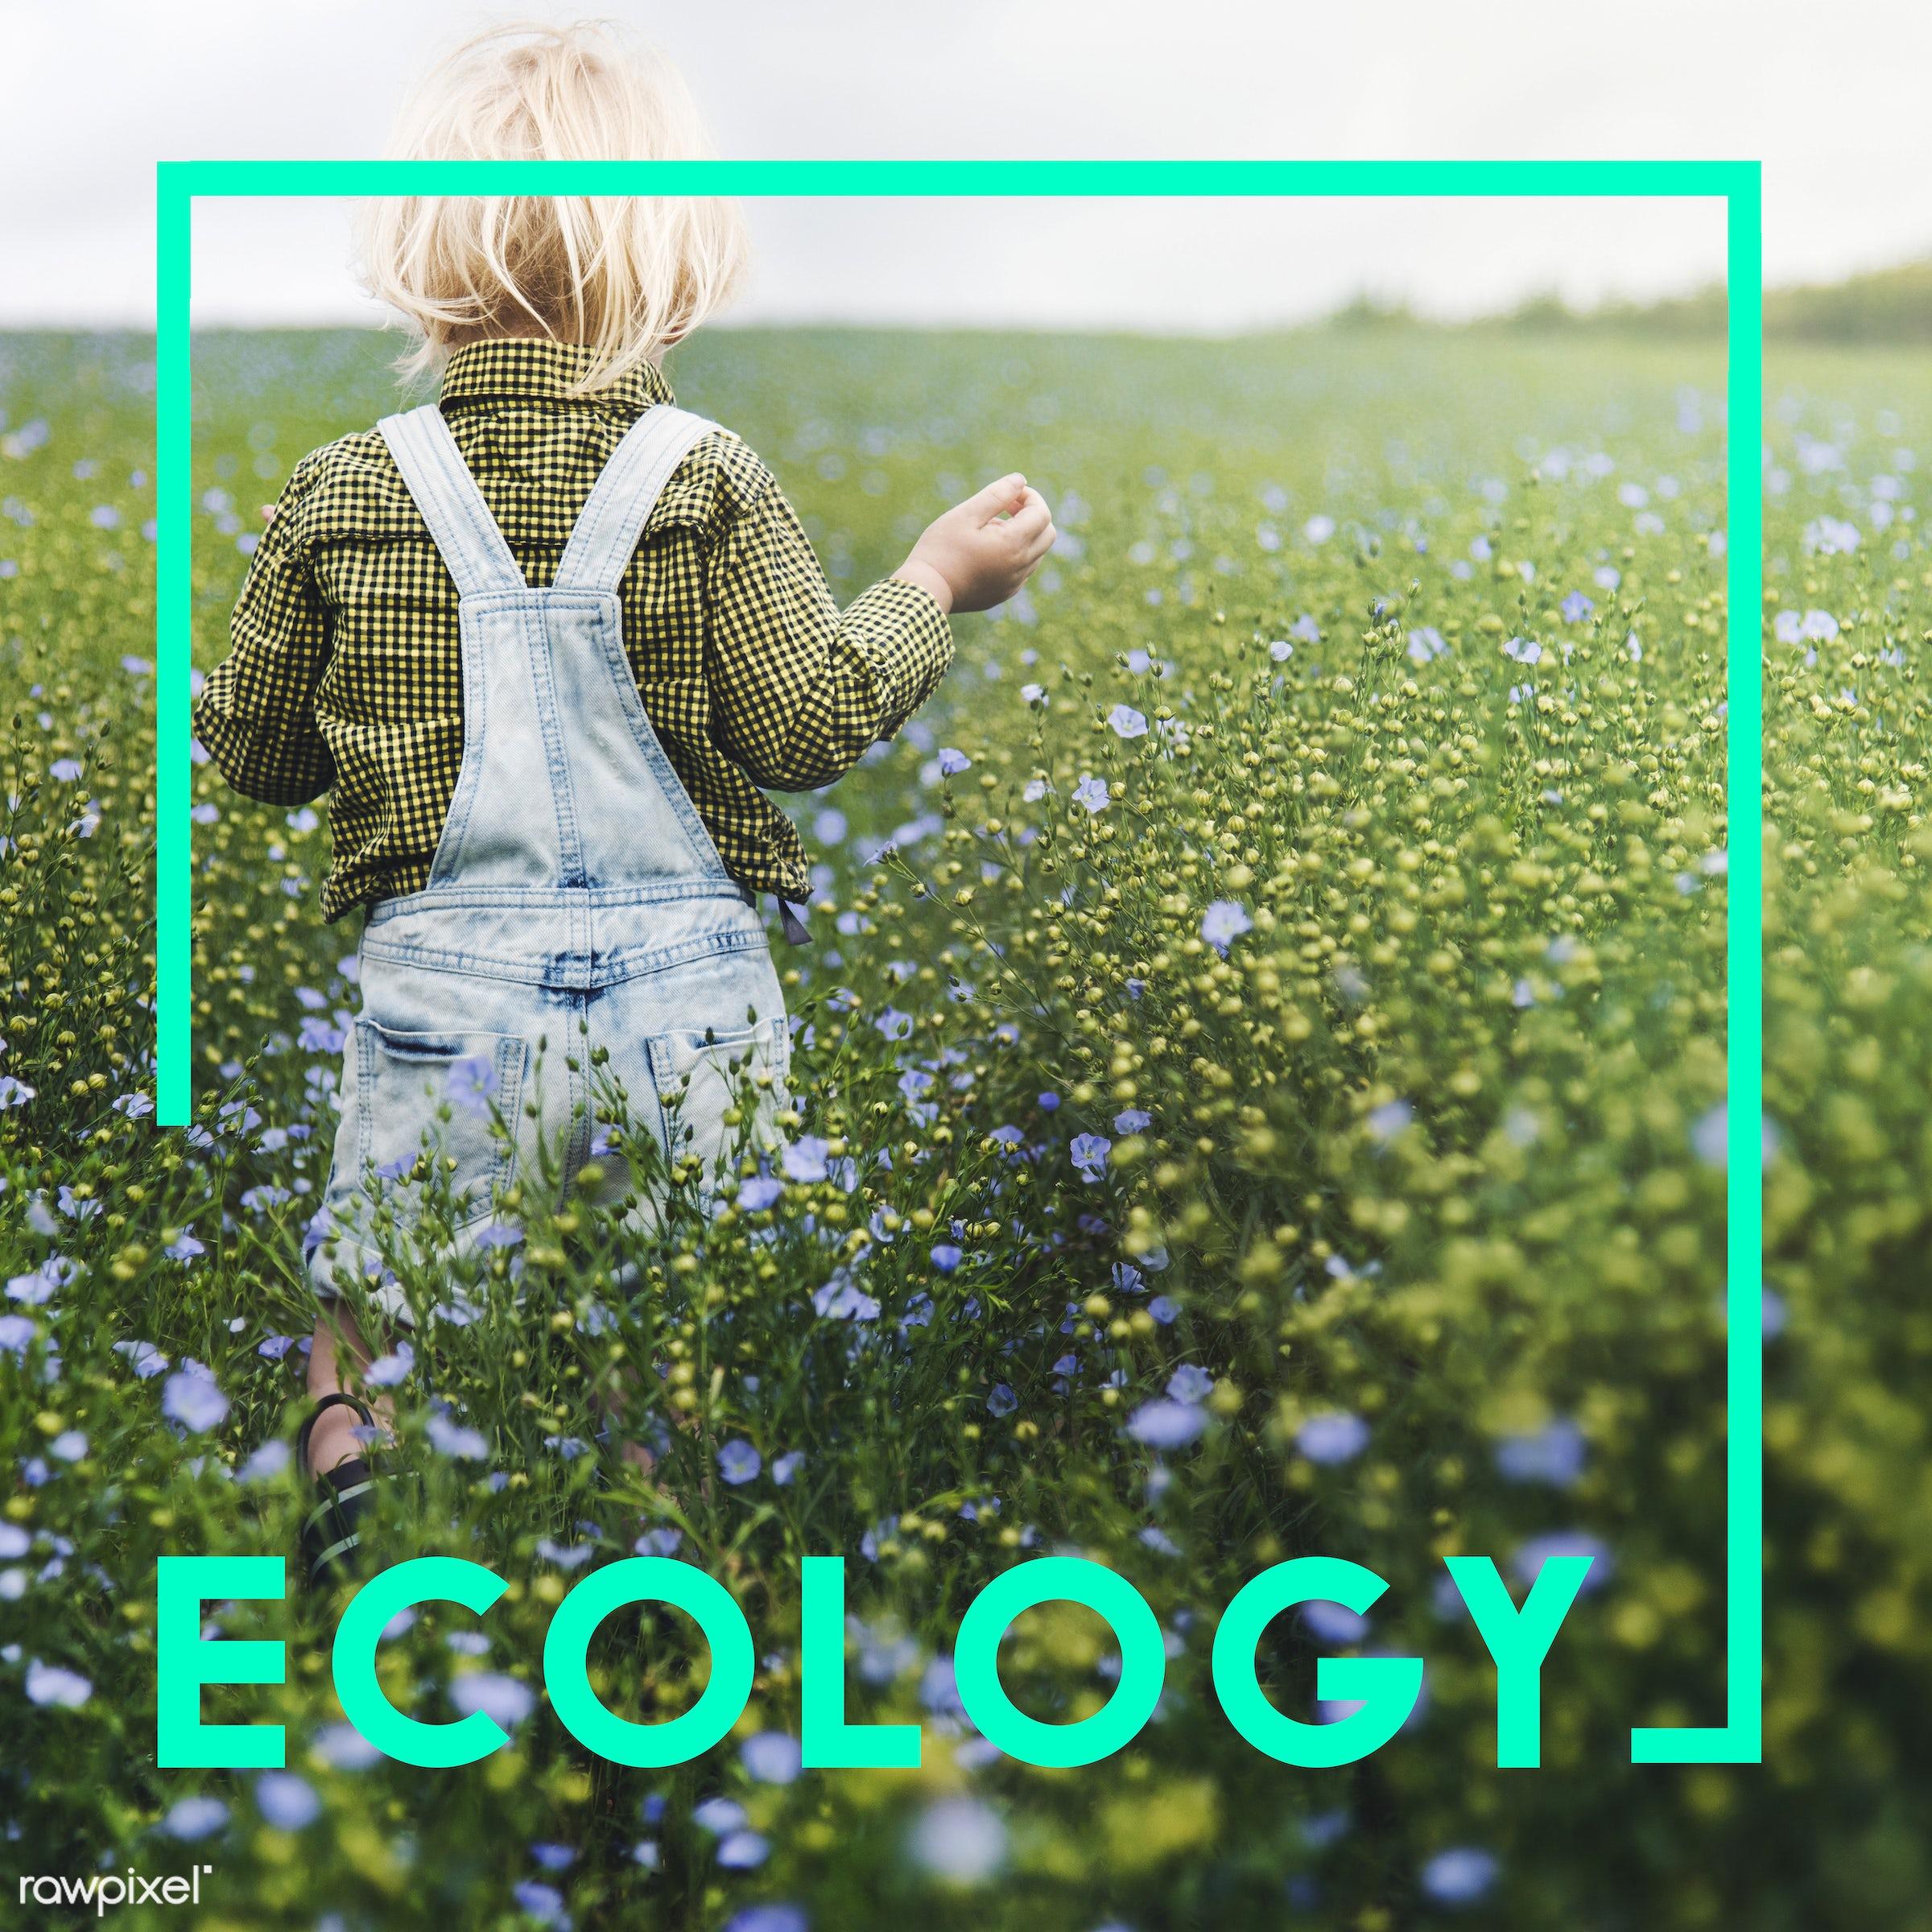 blonde, boy, brand, caucasian, dungarees, eco, ecology, environment, flower garden, flowers, fresh, friendly, garden, go,...